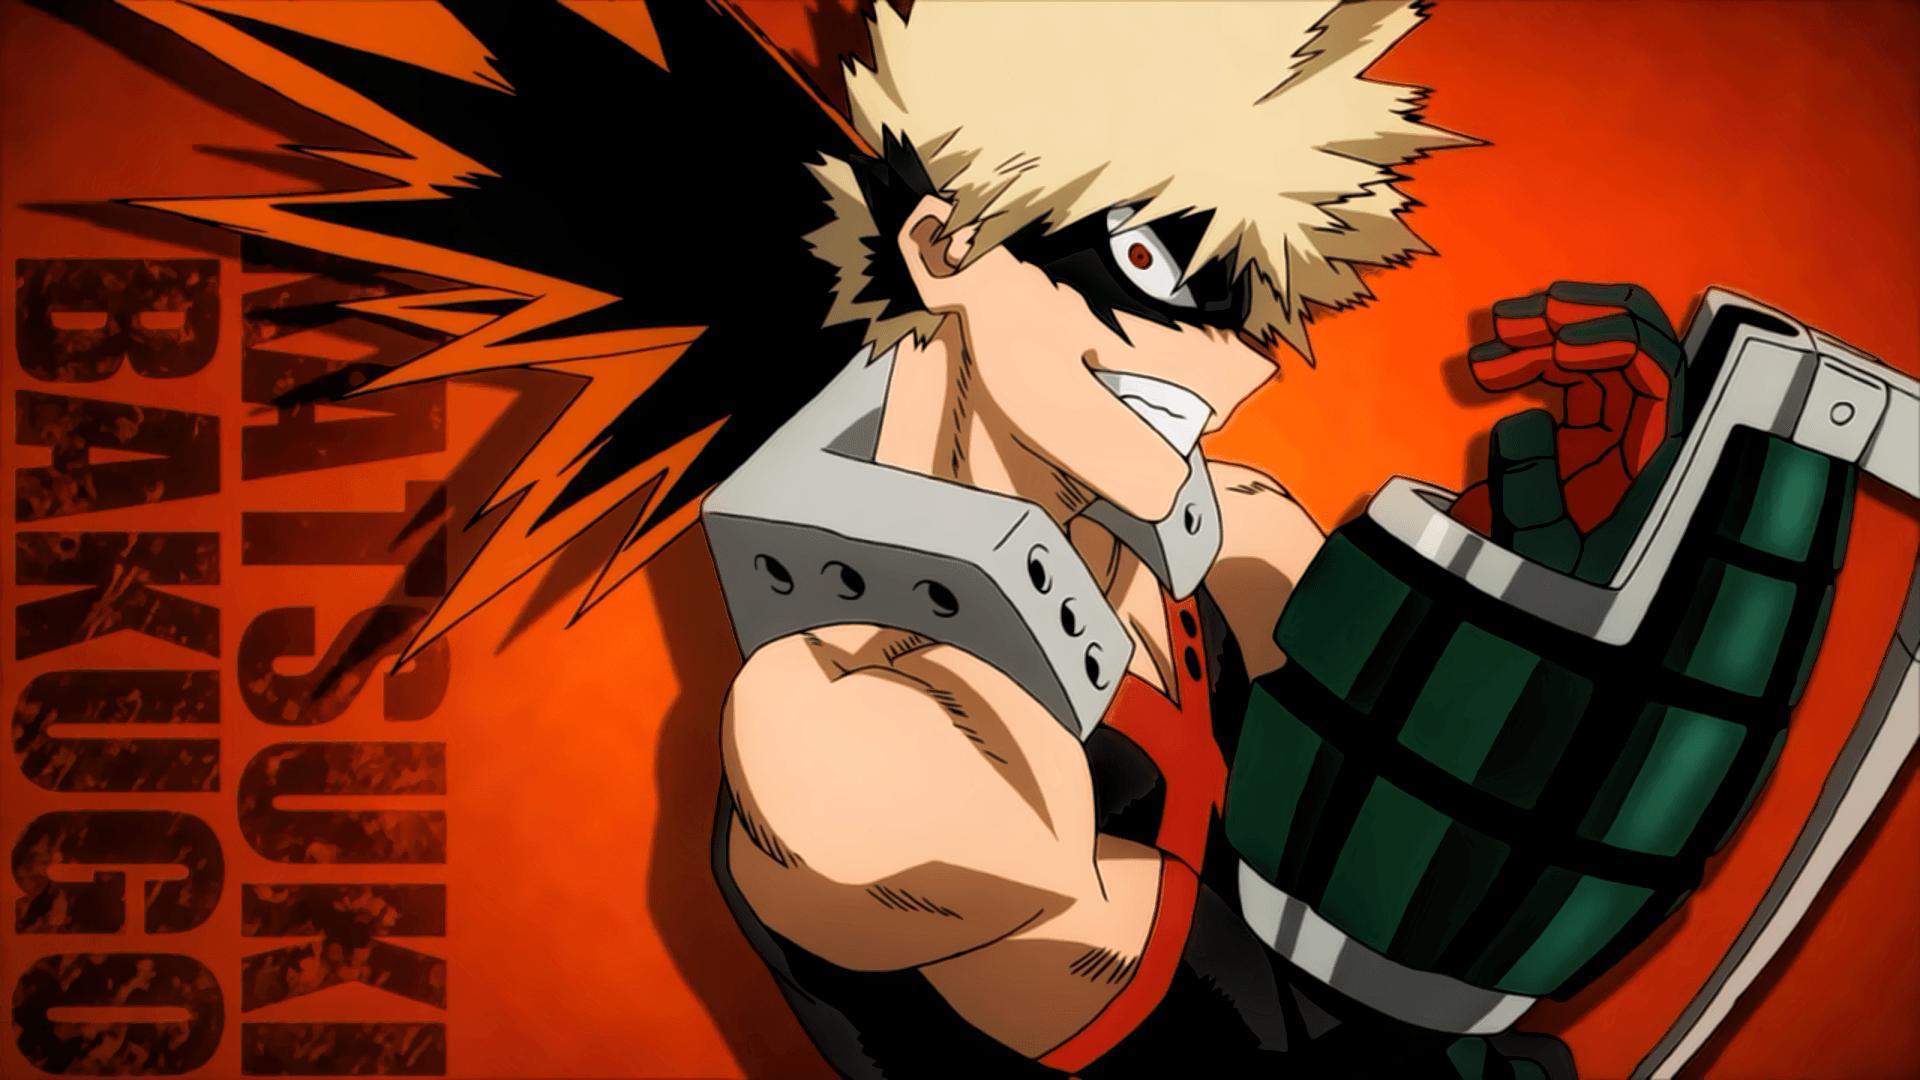 Tons of awesome anime boku no hero academia wallpapers to download for free. Boku No Hero Academia Wallpapers - Wallpaper Cave